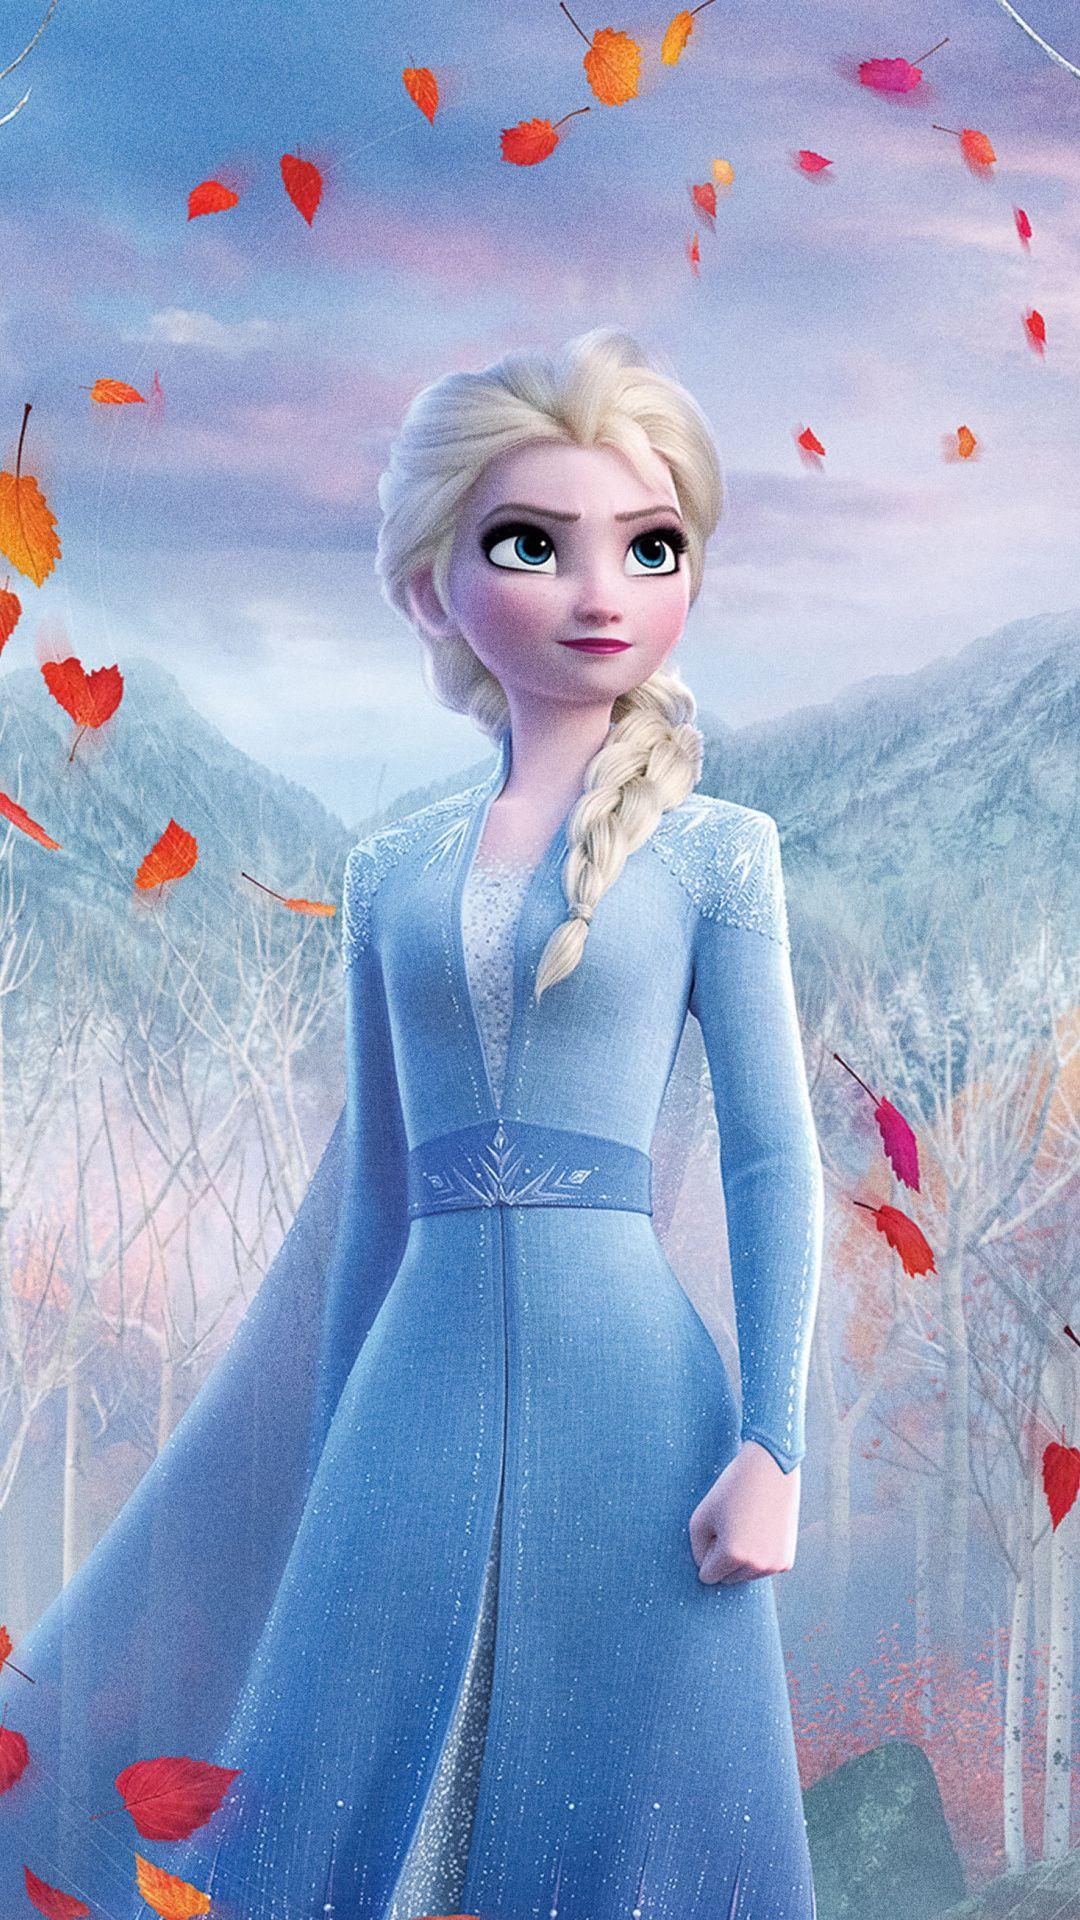 Frozen 2 Elsa Fifth Element Hd Image Disney Princess Frozen Disney Princess Elsa Frozen Disney Movie